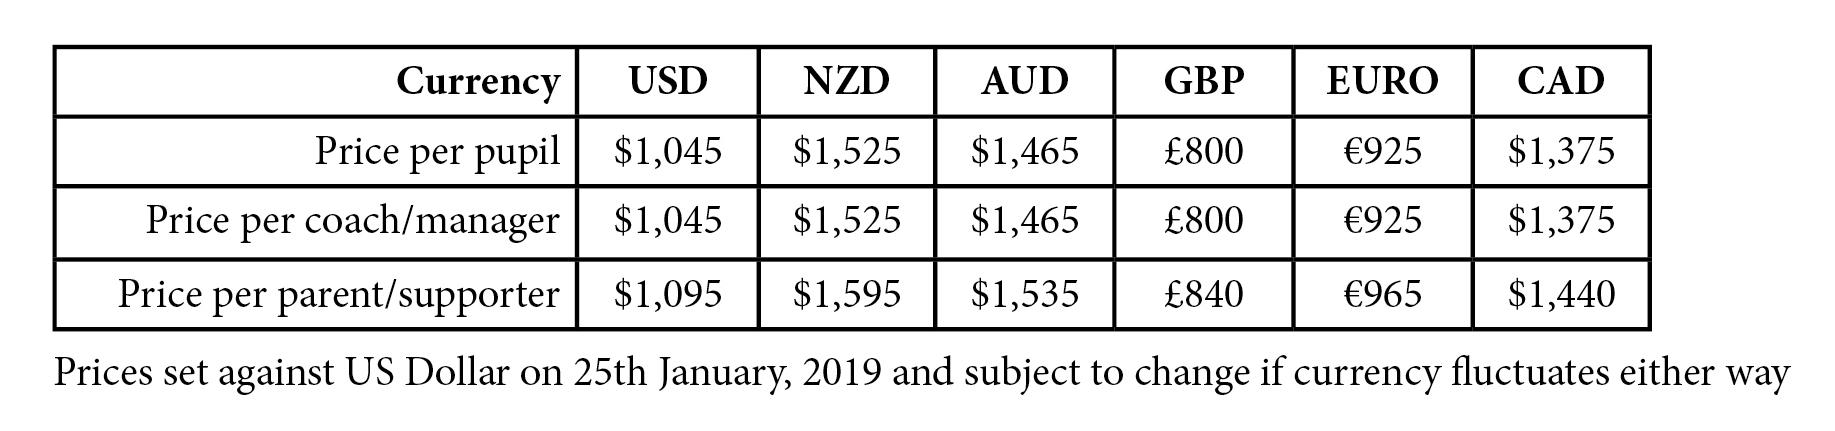 schools costs table.jpg